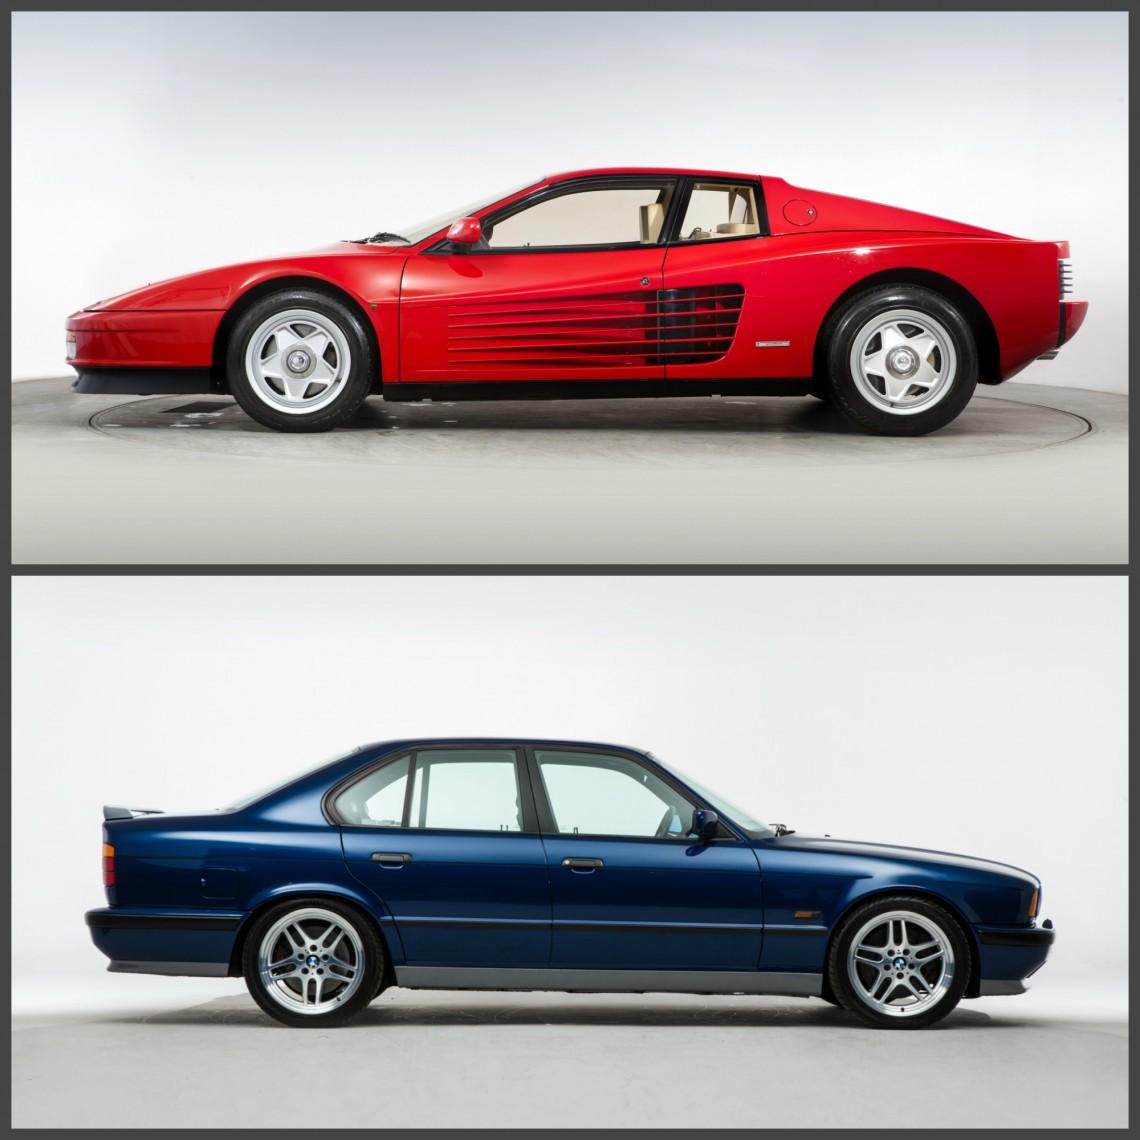 BMW M5 (E34) против Ferrari Testarossa, перевод CAR